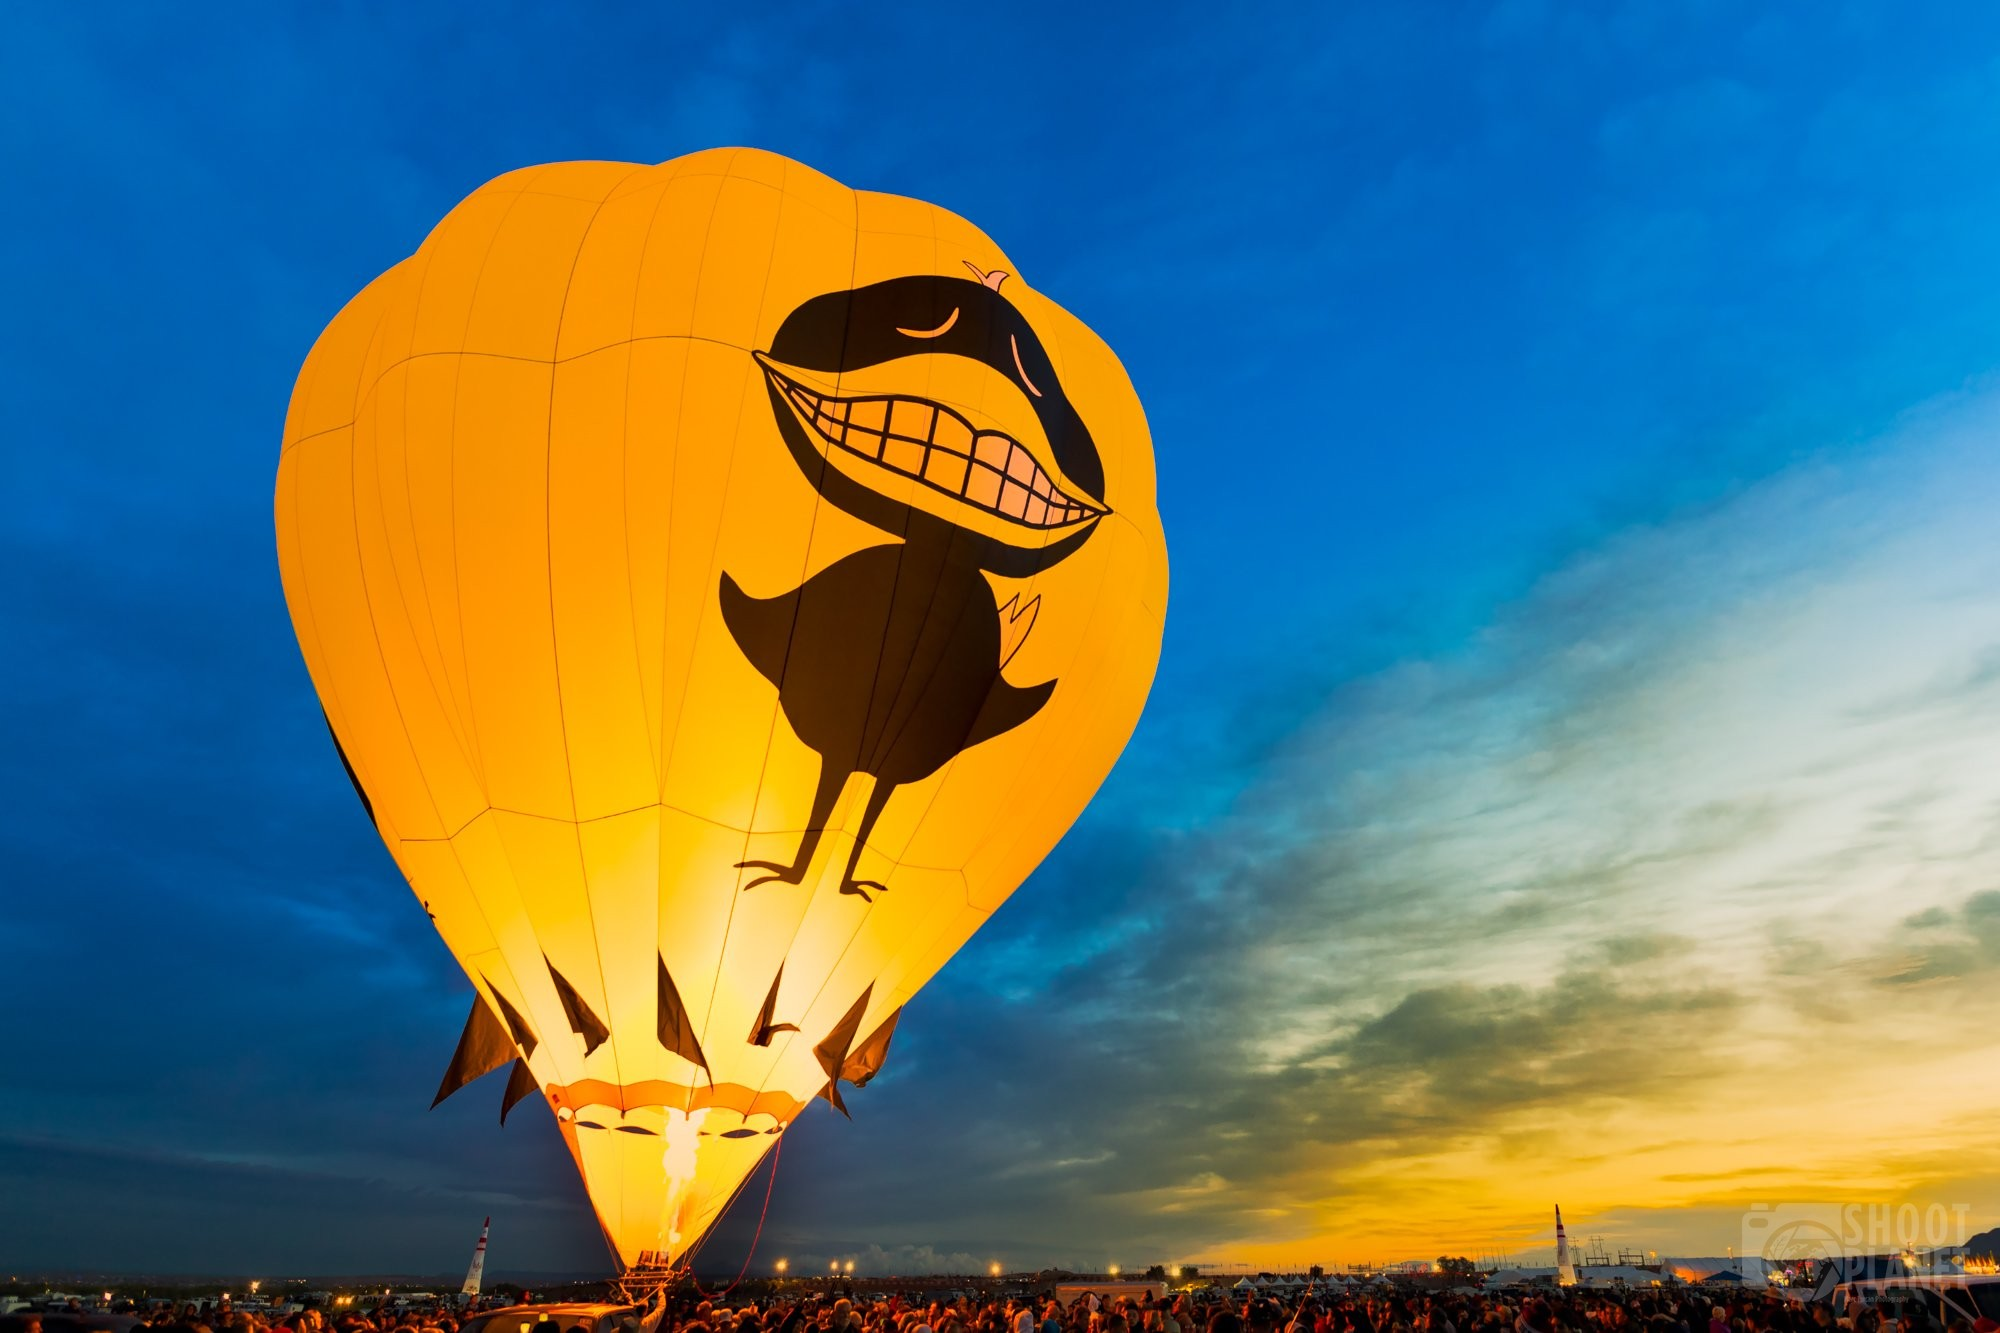 Yellow sunrise and hot air balloon, Albuquerque